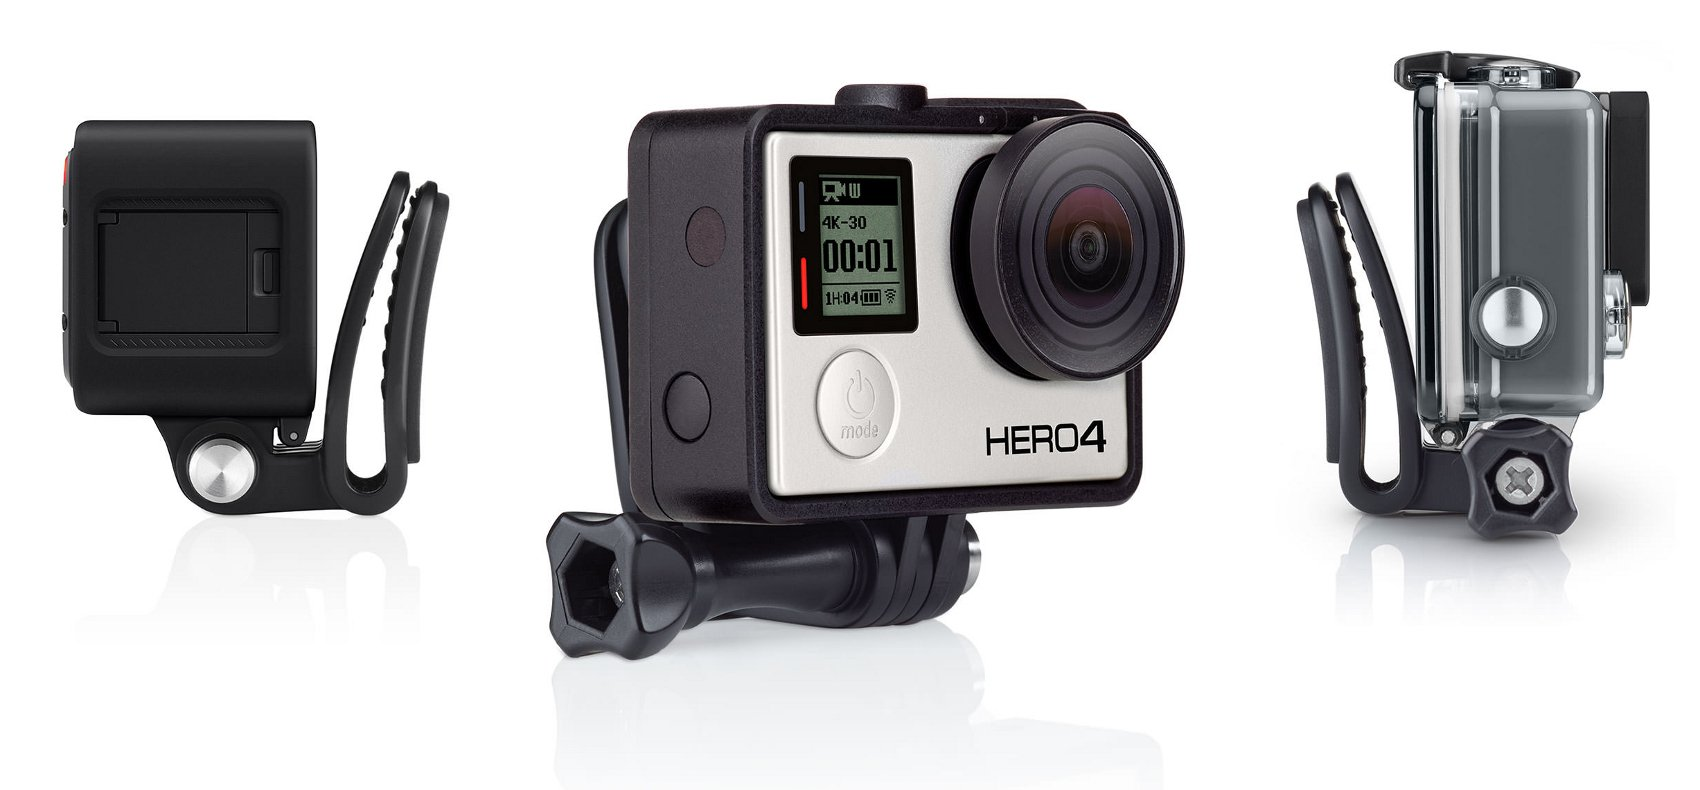 Camera Mount For GoPro Cameras